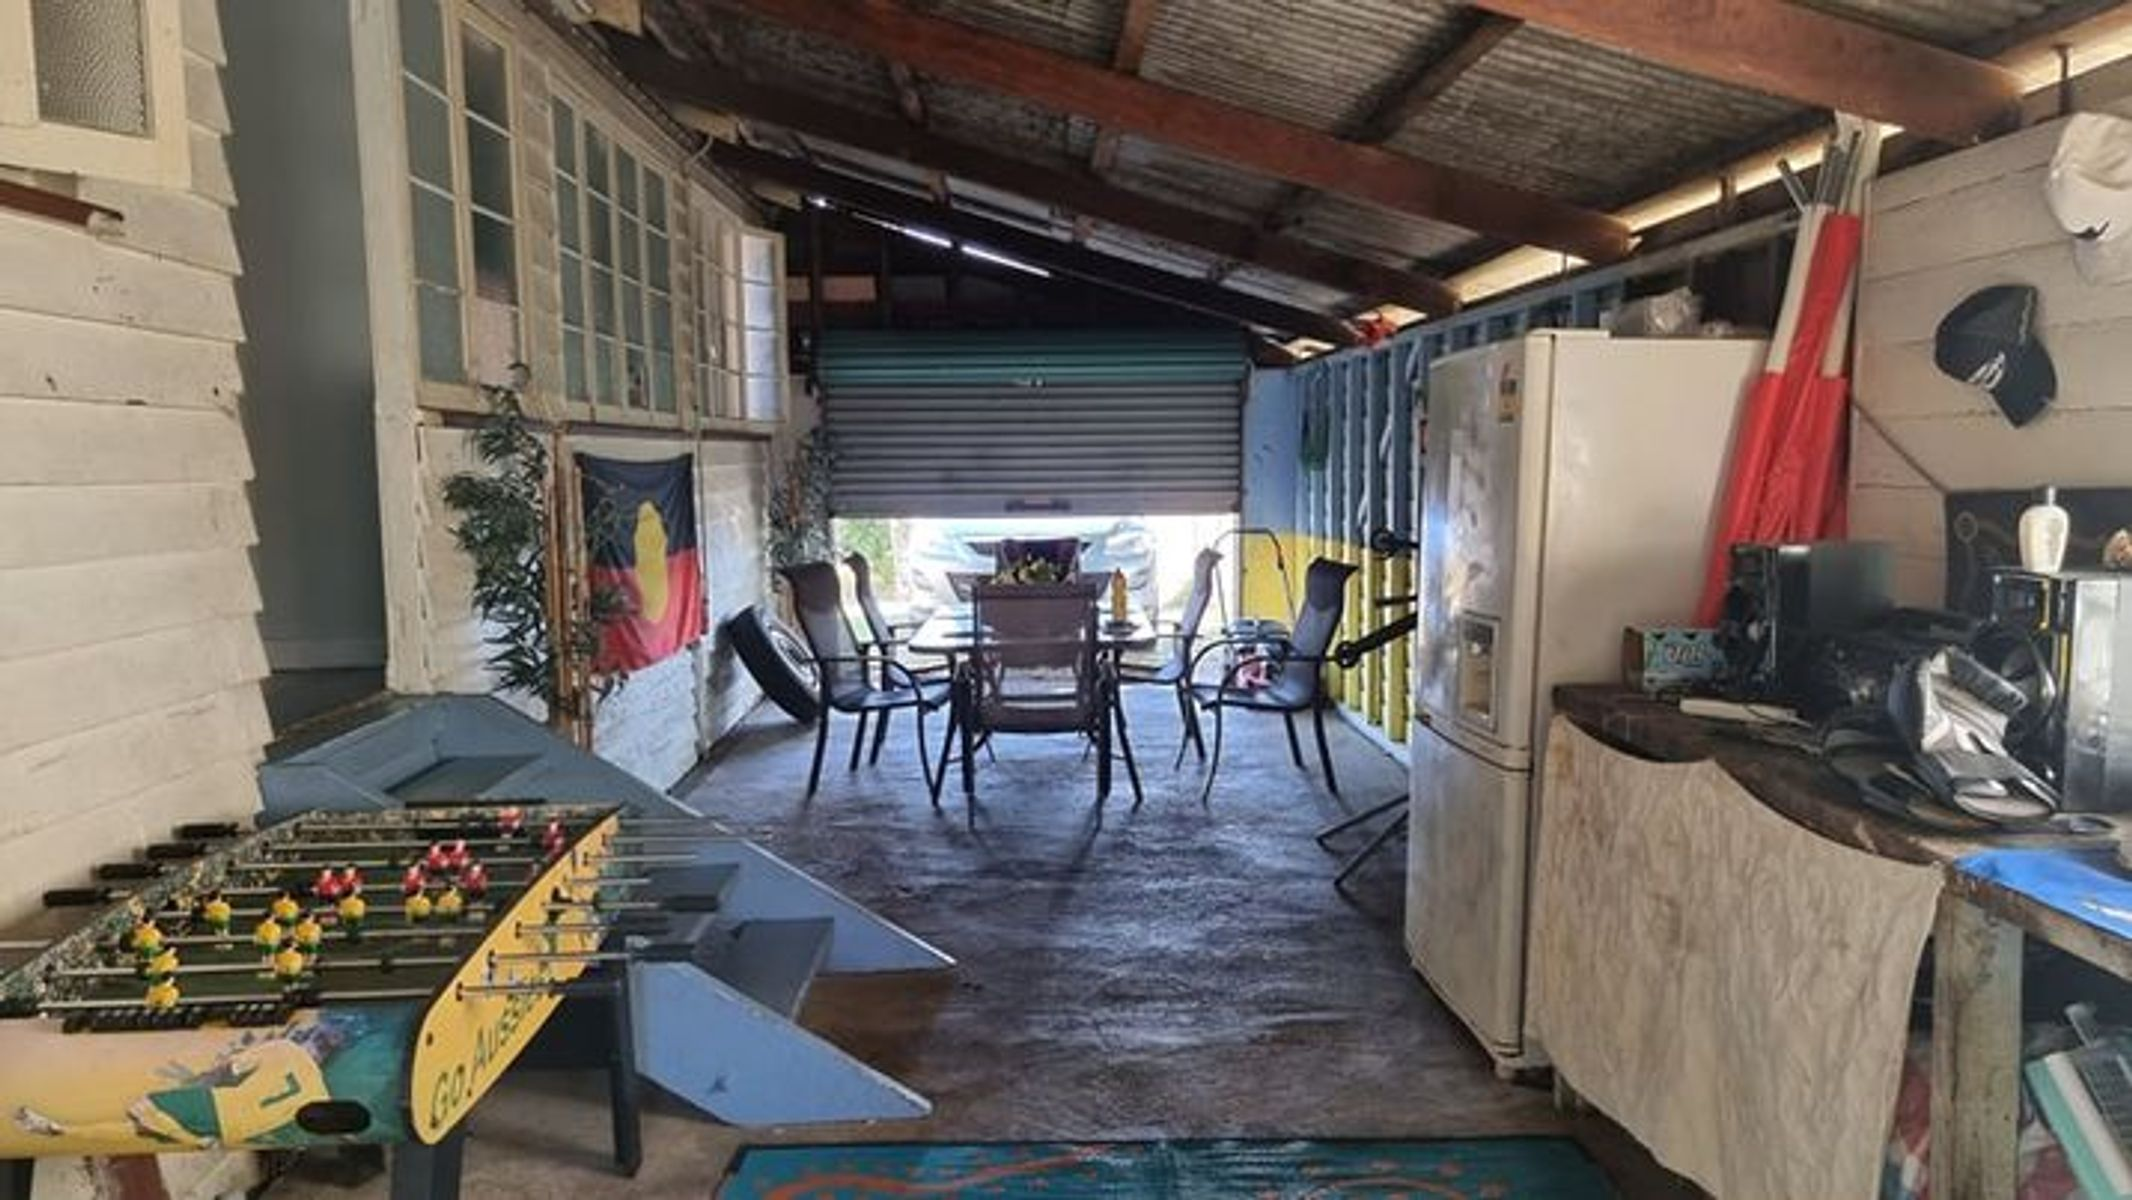 146 Hinchliff Street, Kawana, QLD 4701